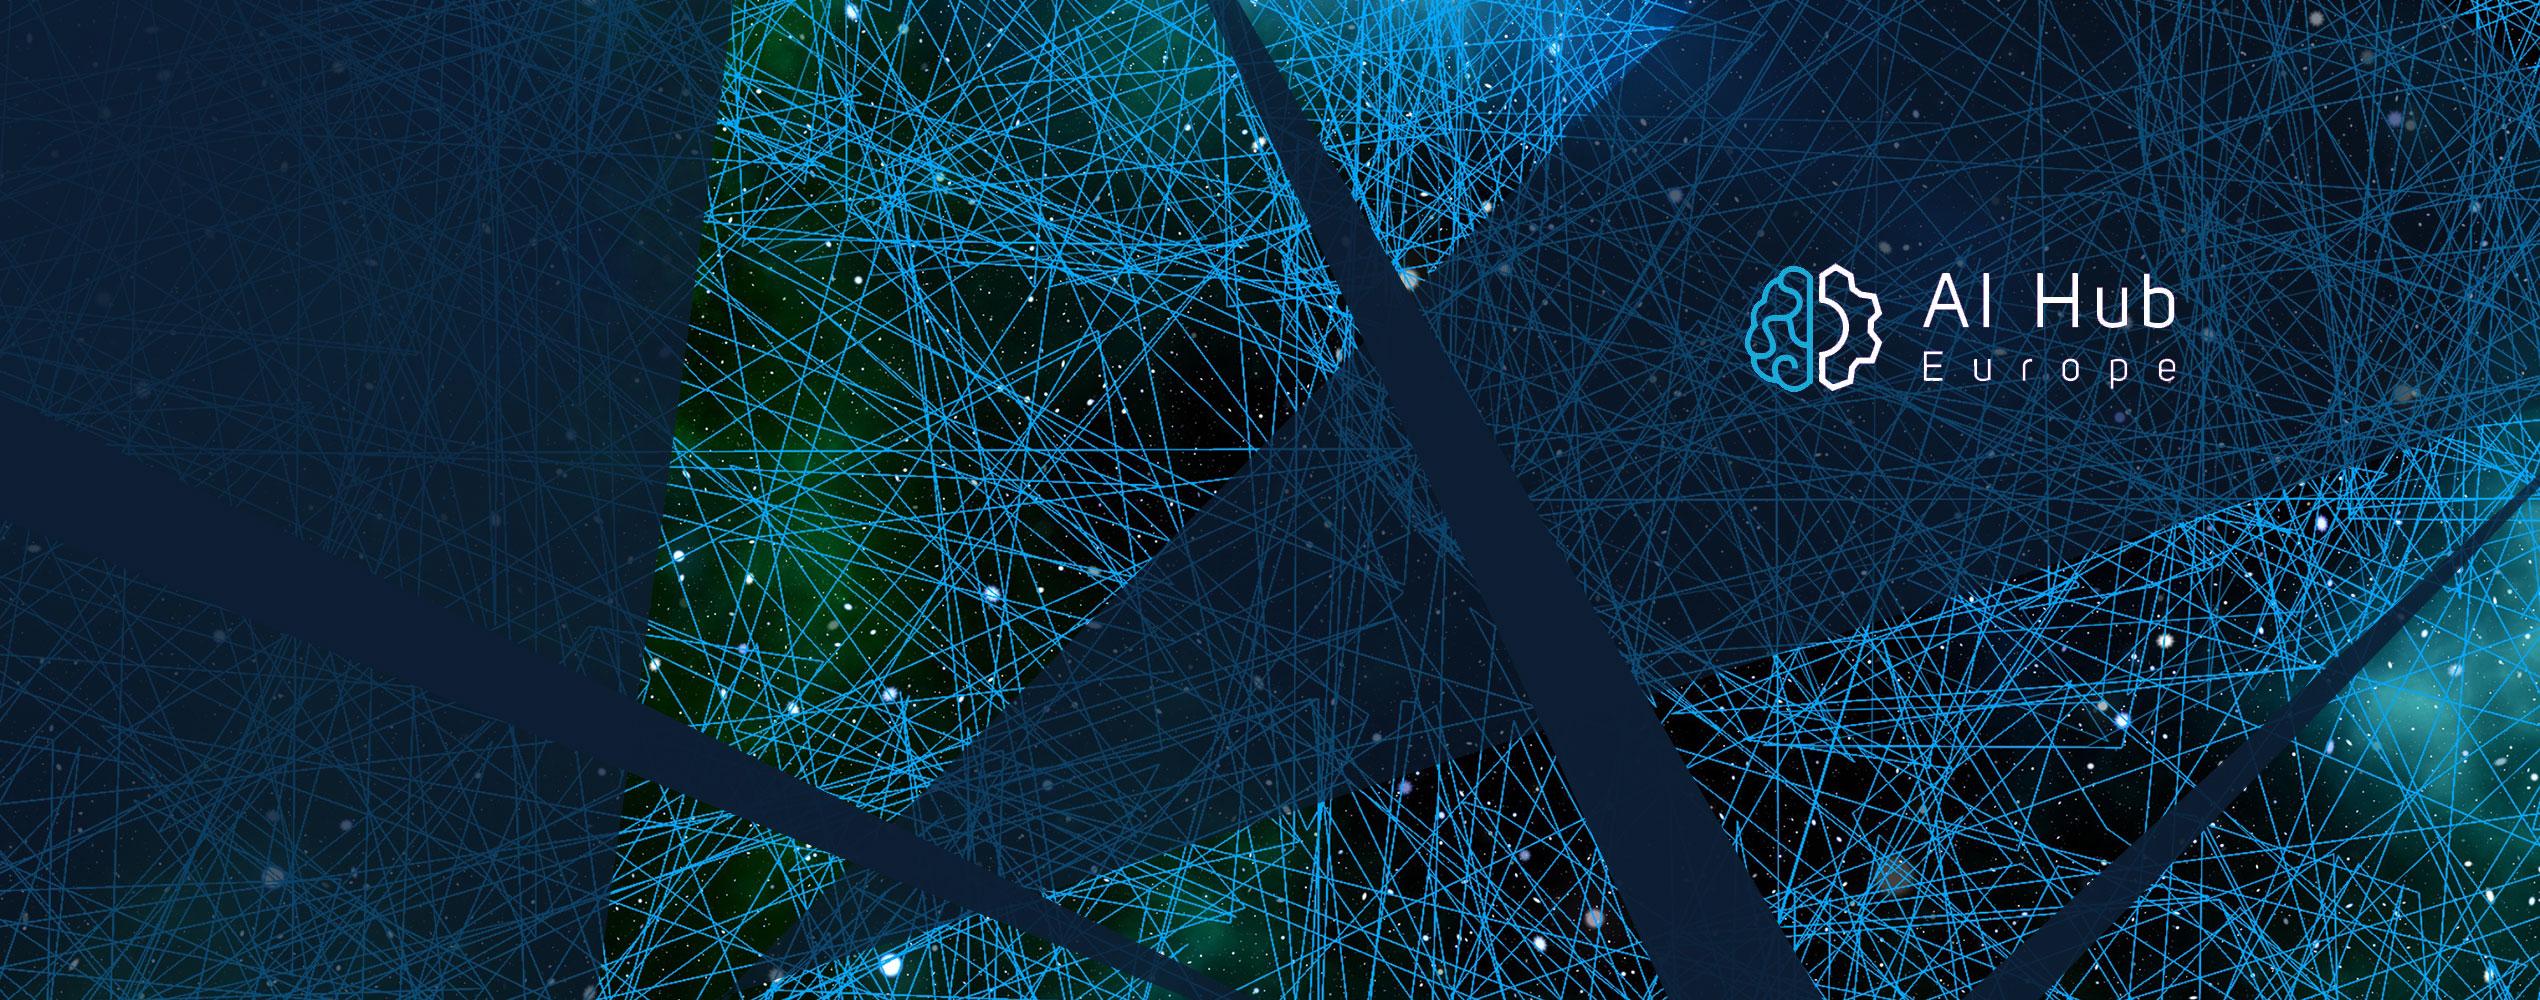 Ai-HUB-Event-HEADER-2540x1000-pixabay-geralt-system2660914-Montage